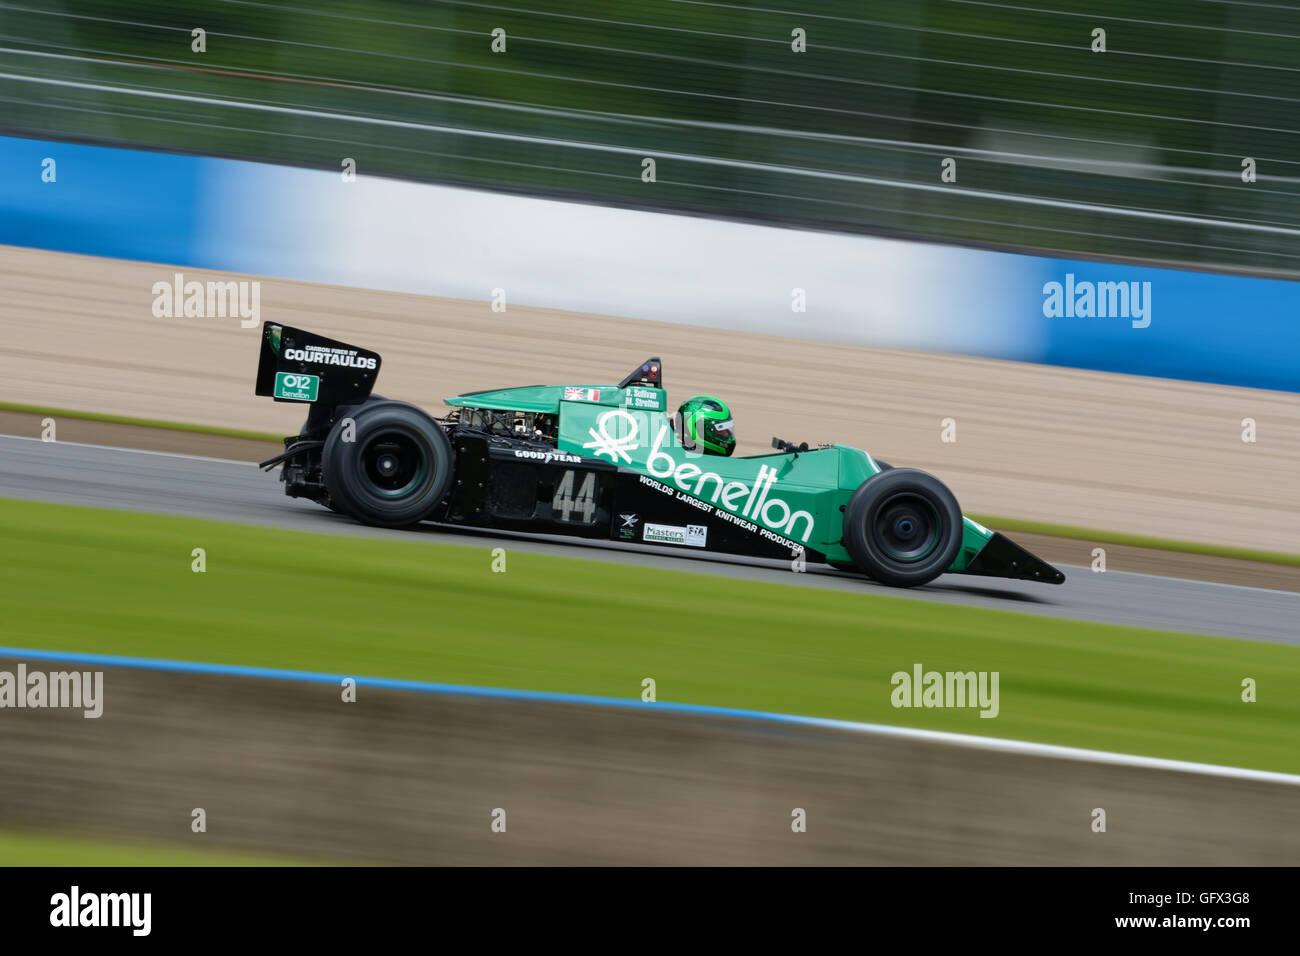 Benetton classic F1 race car. - Stock Image